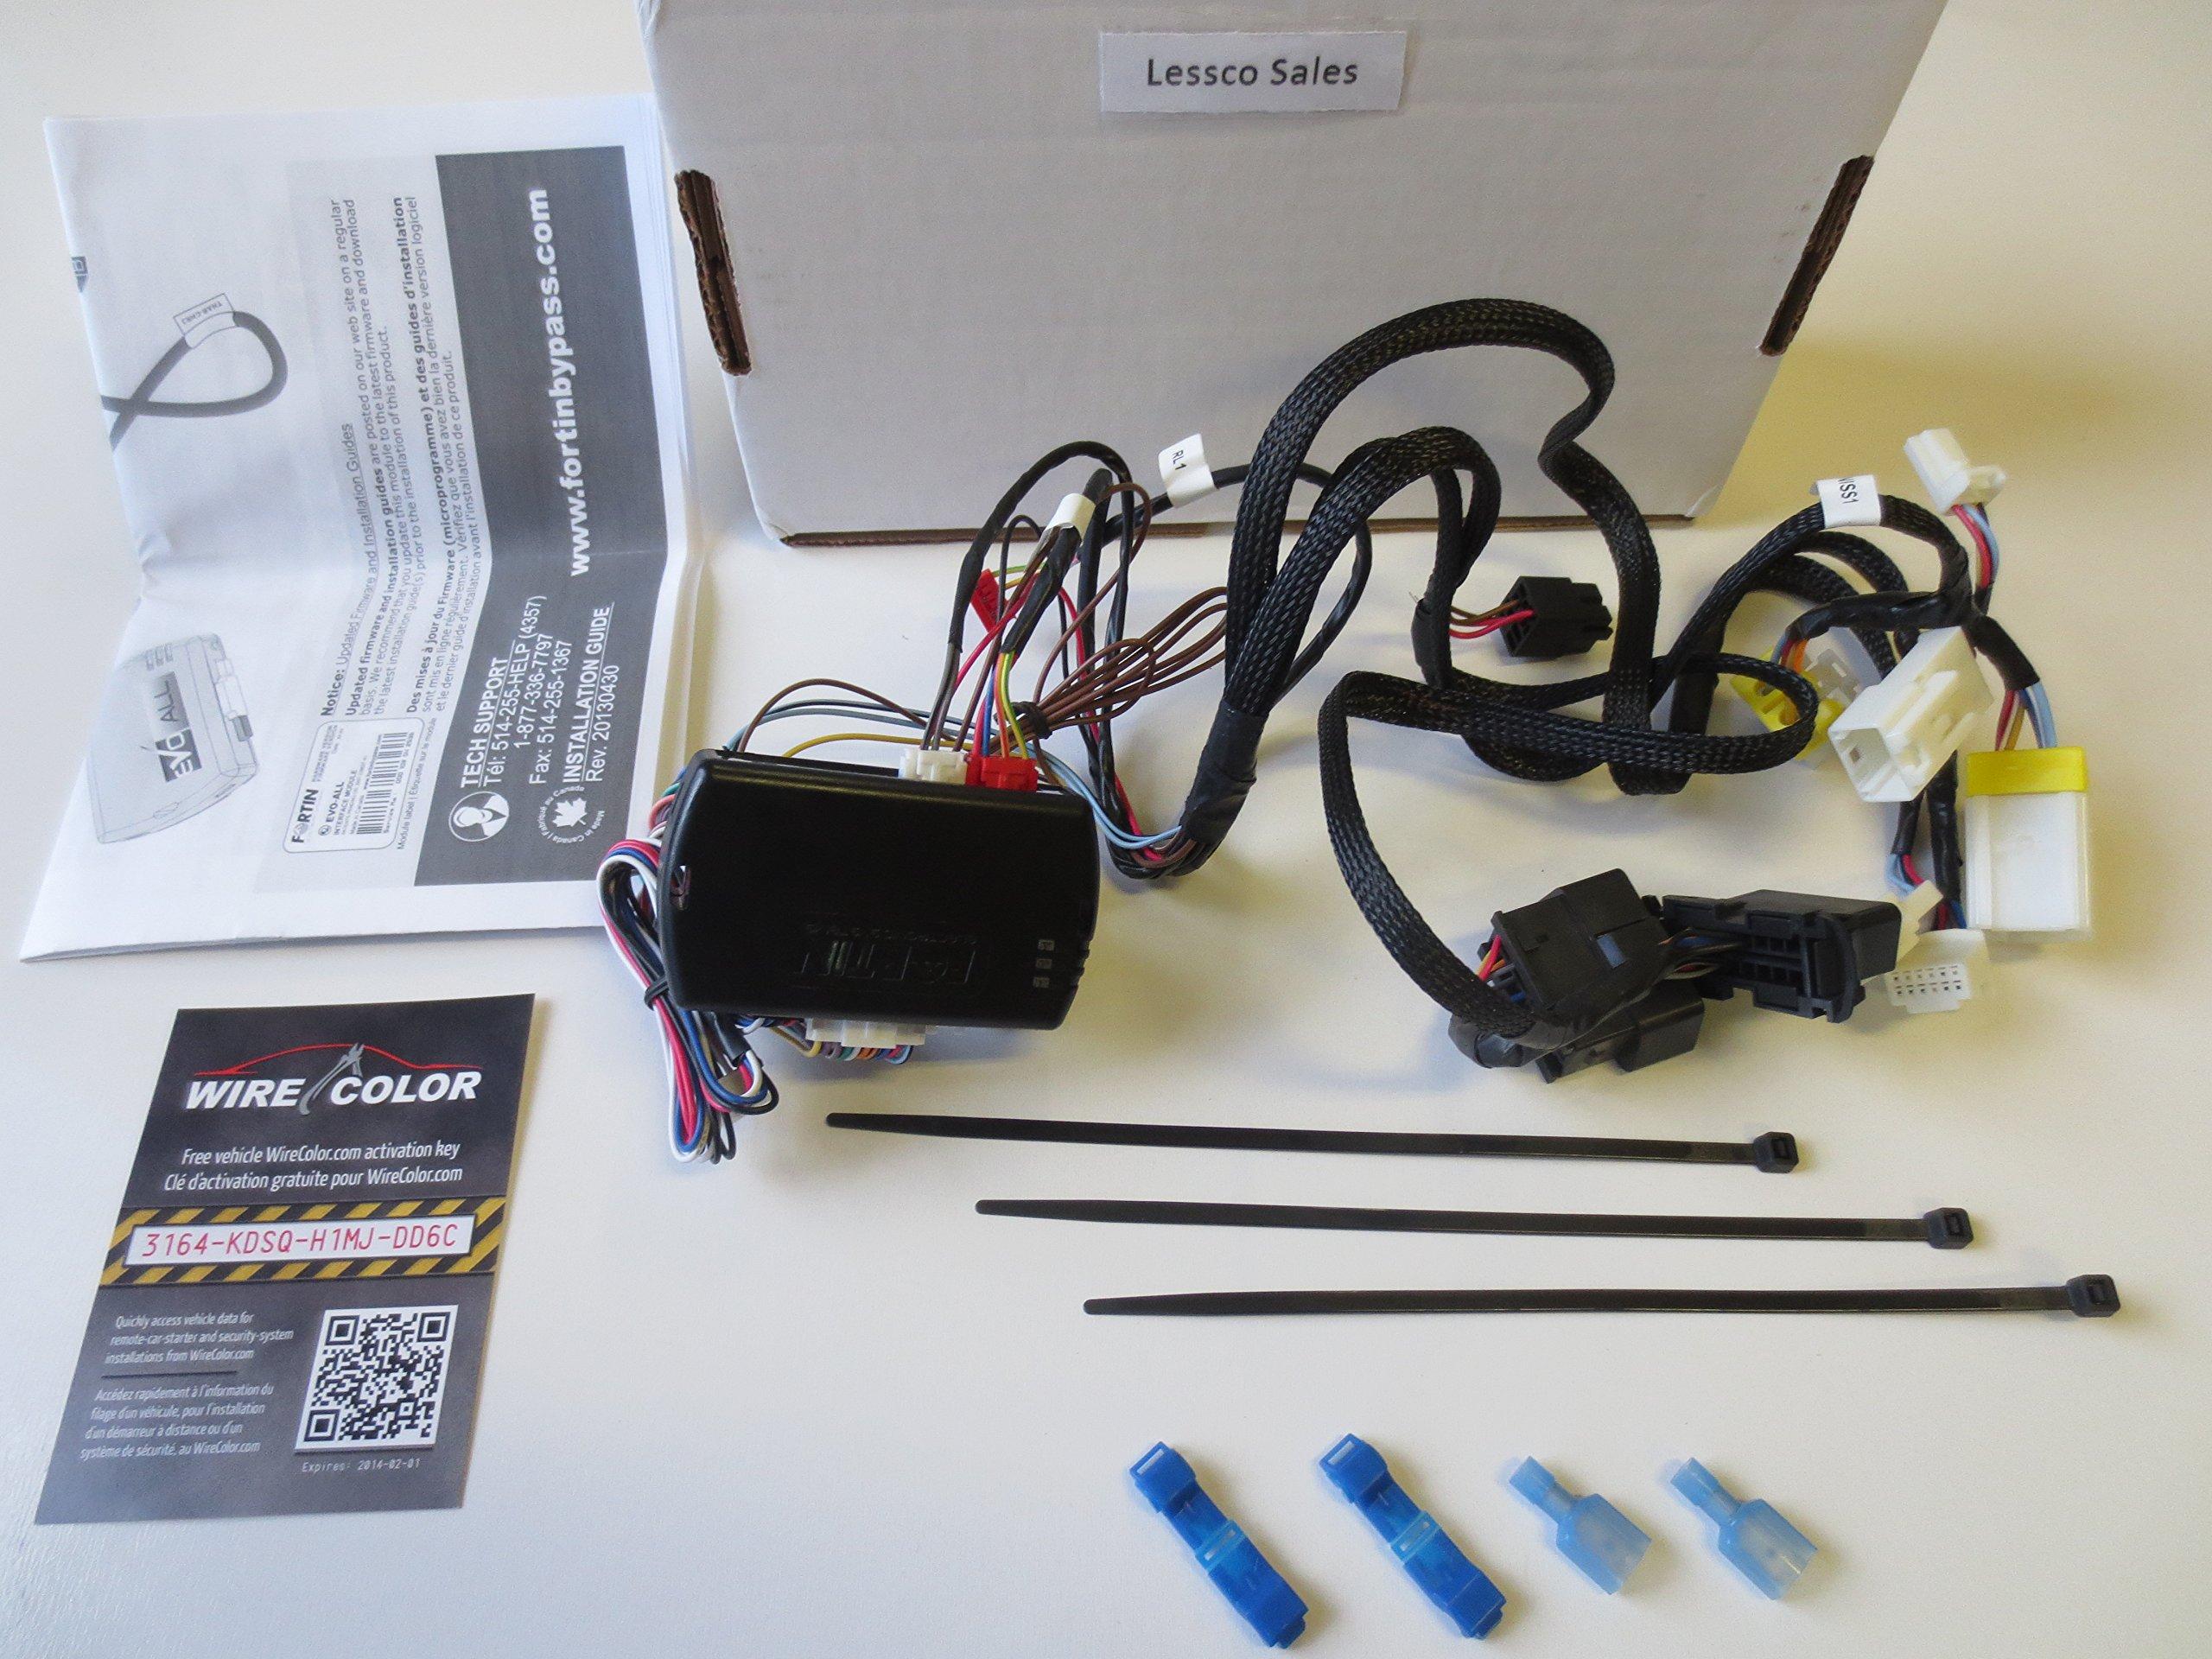 2013 2015 Nissan Altima Sedan Remote Engine Auto Start Starter Kit New